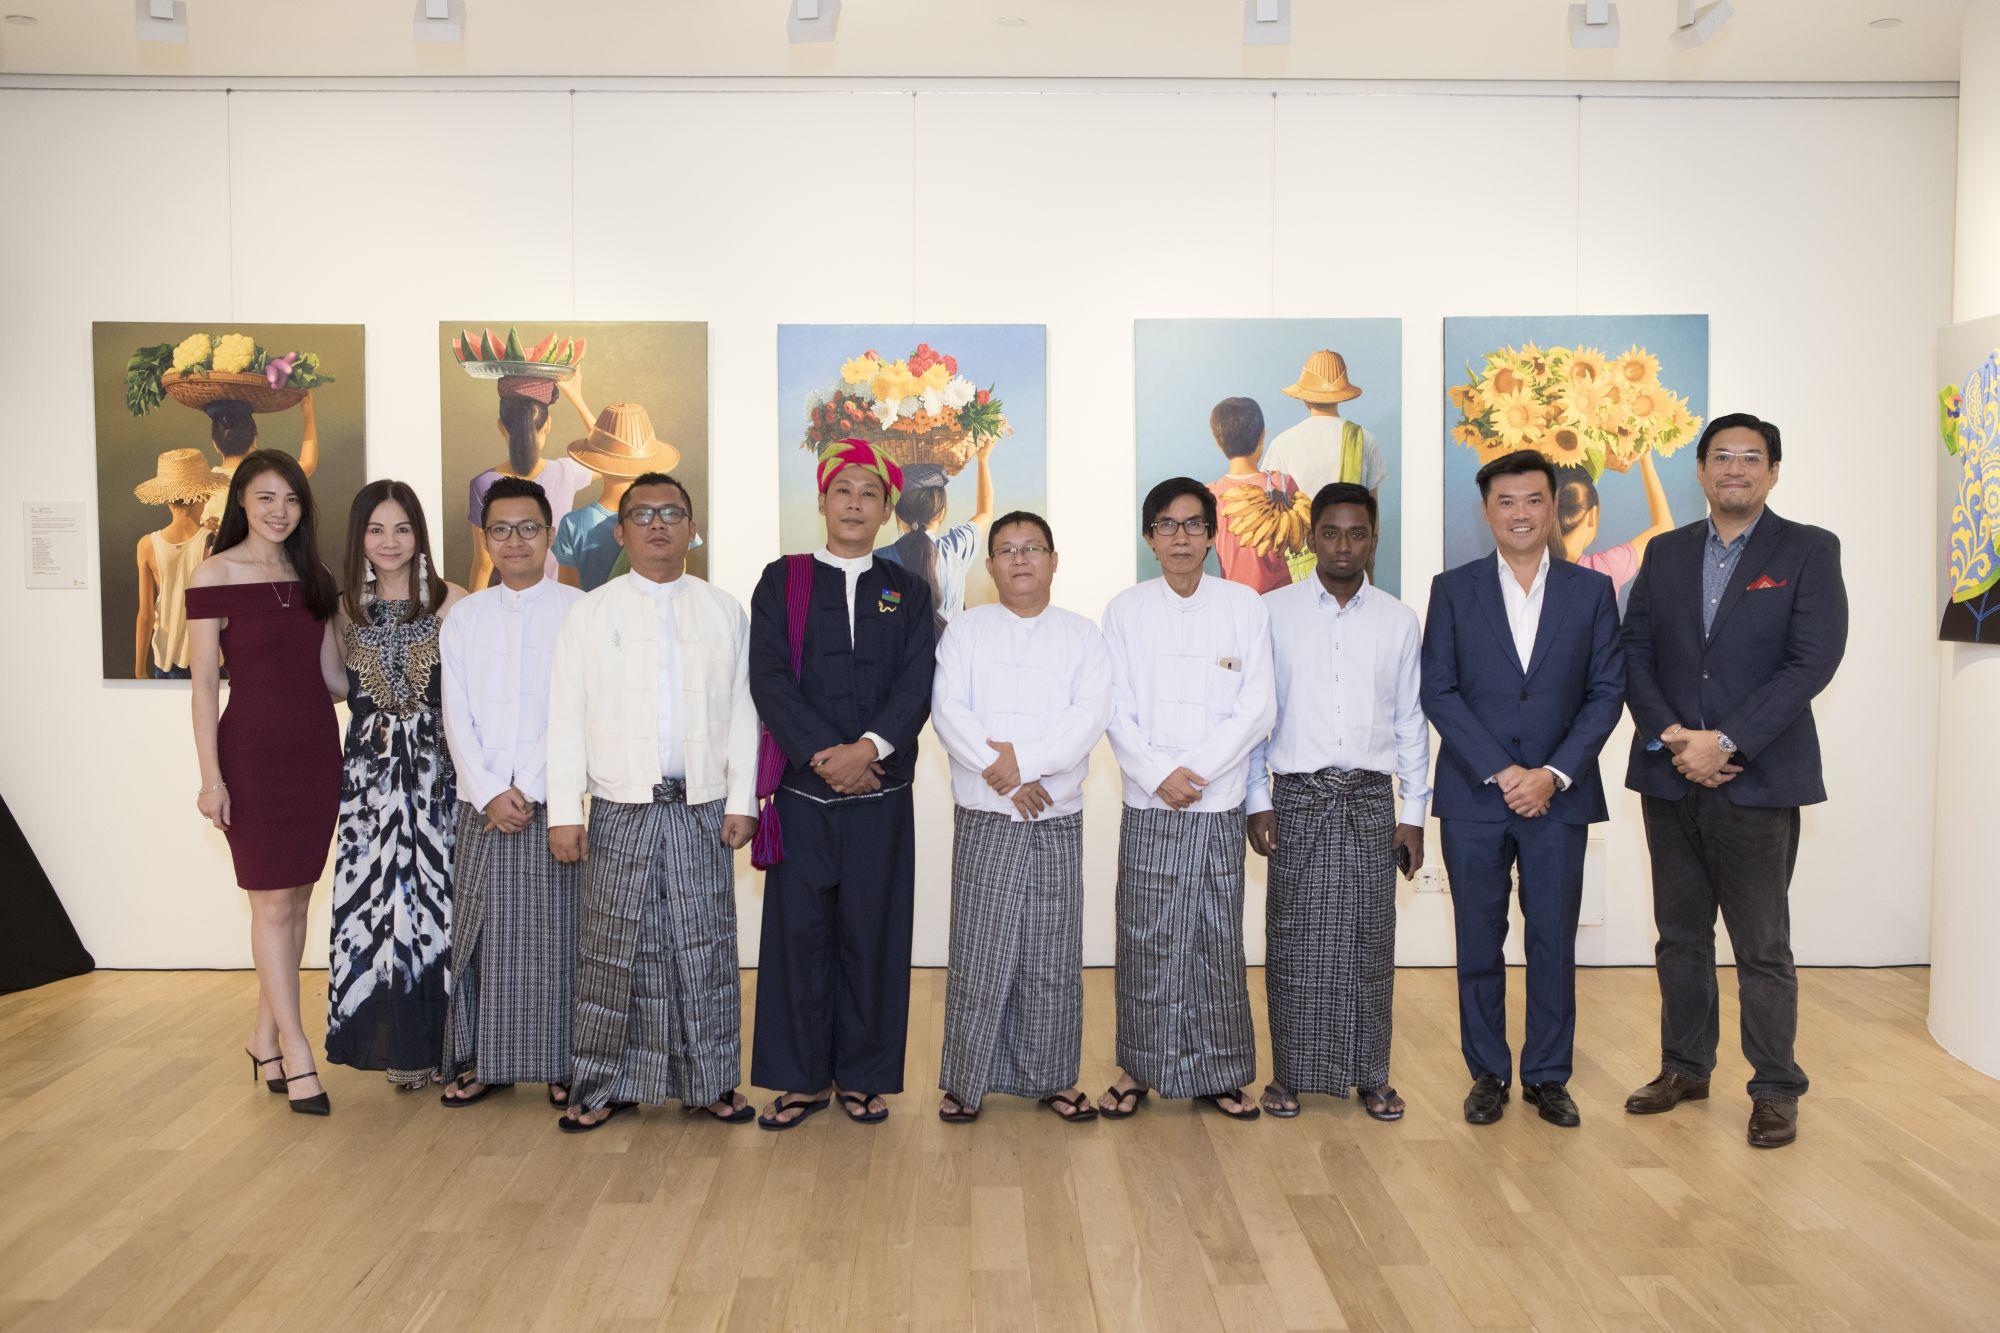 Jasmine Foo, Jacelyn Lai, Ngwe Phyoe, Byardate, Moe Myint Zaw, Ngwe Aung, Kyi Hlaing Aung, Gerald Lee, Danny Tan